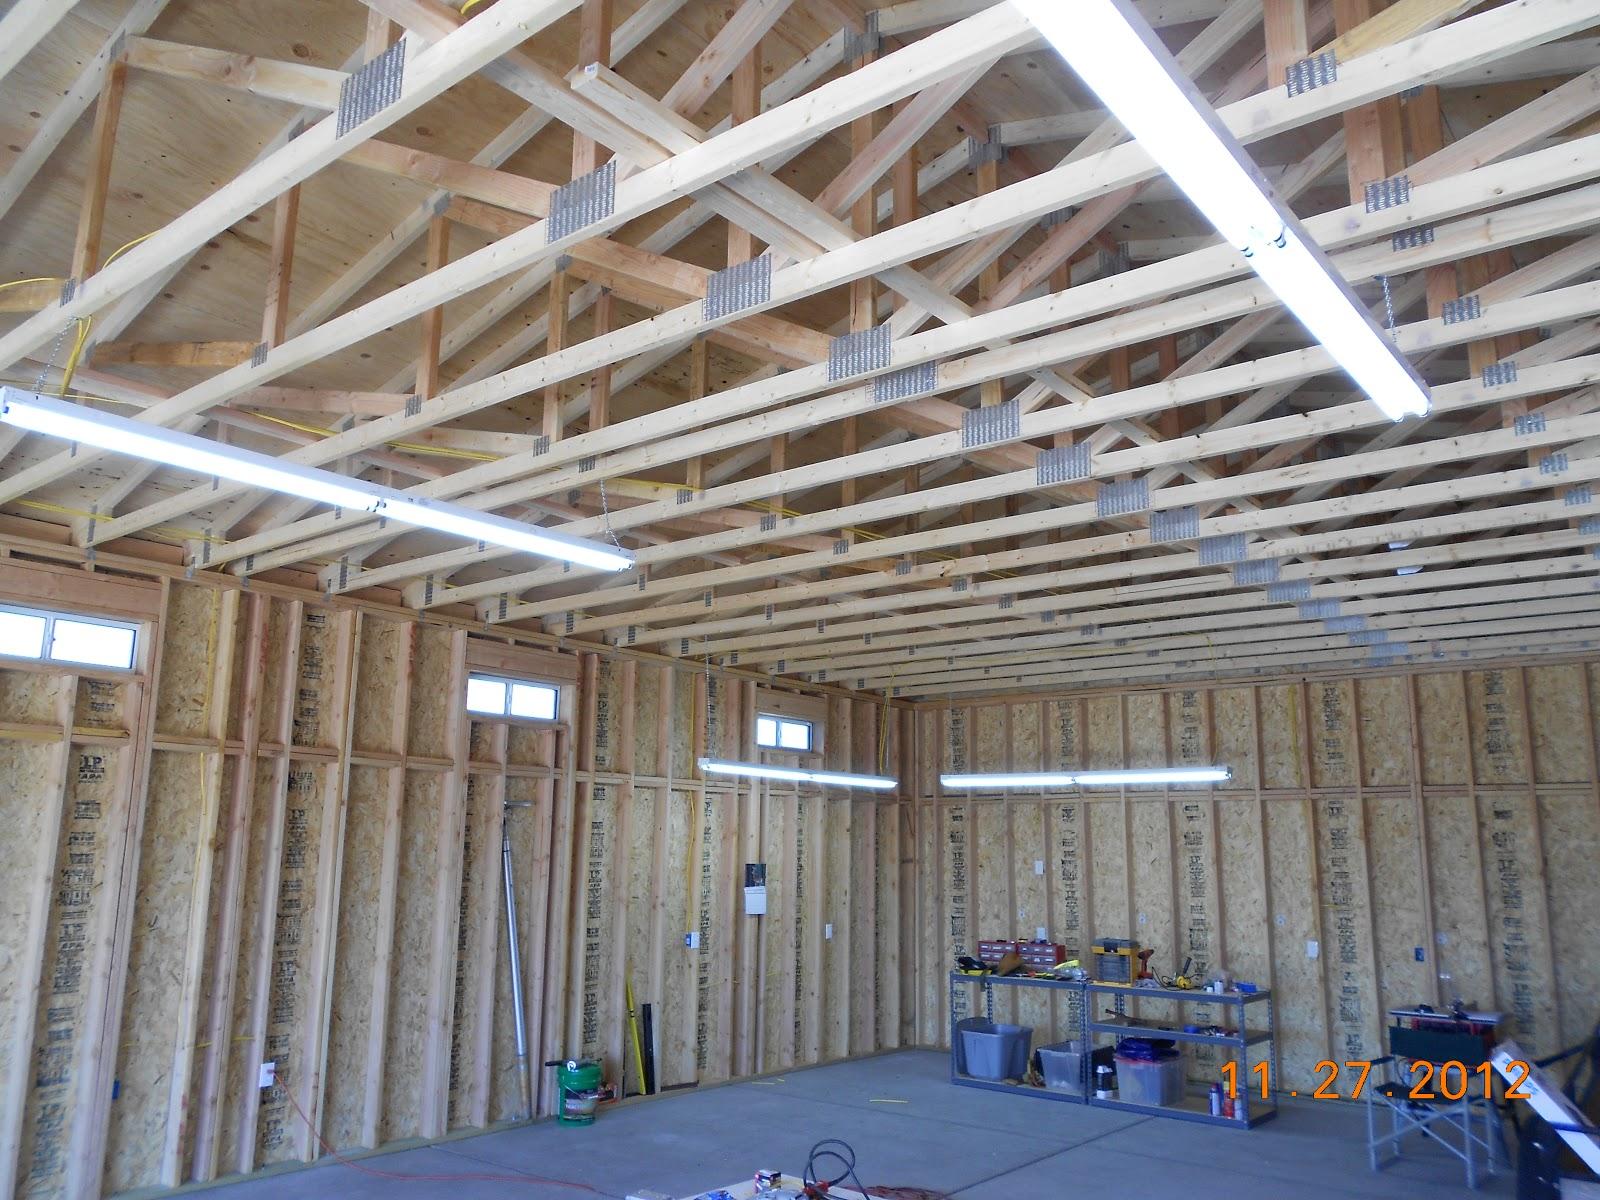 garage electrical wiring diagram lights detailed wiring diagrams rh standrewsthorntonheath co uk detached garage sub panel wiring detached garage sub panel  [ 1600 x 1200 Pixel ]